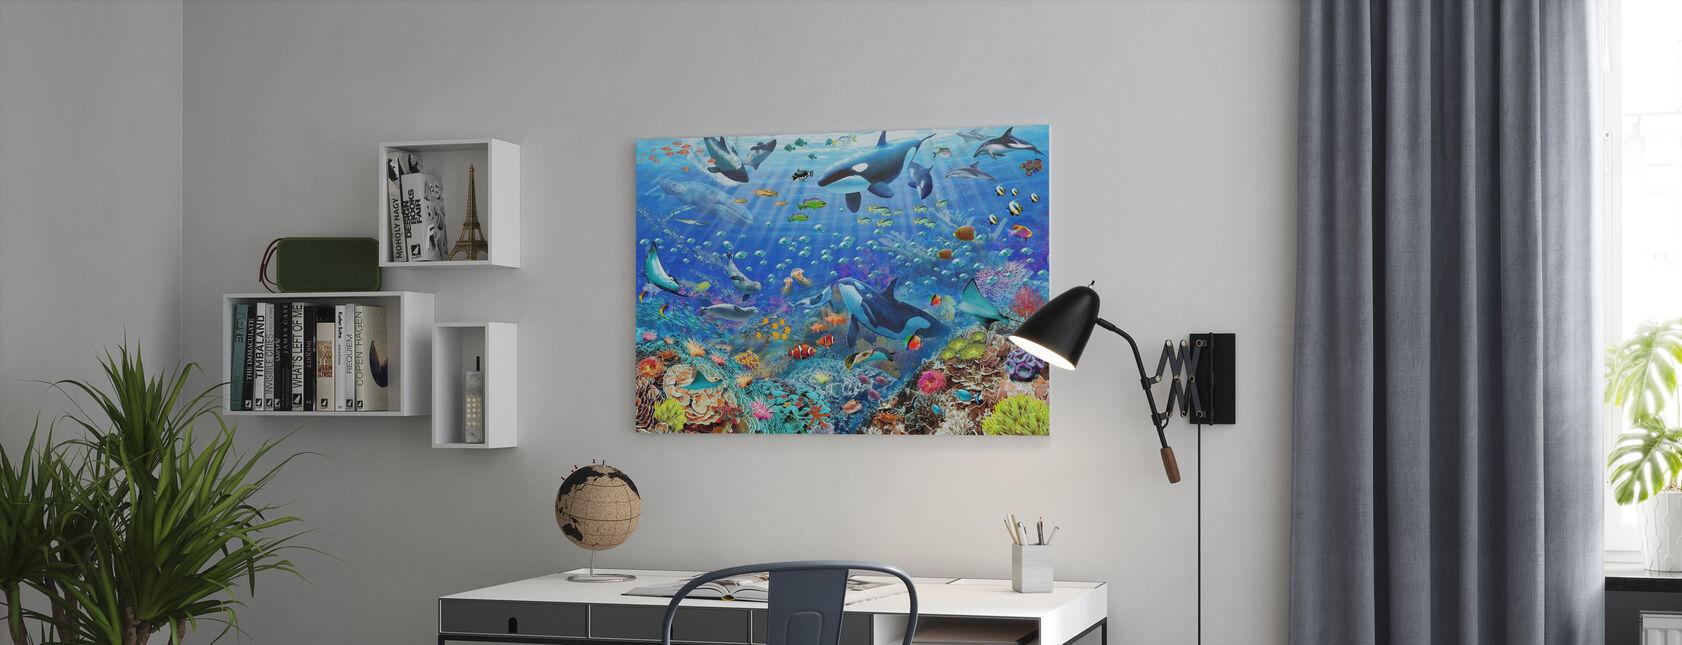 Underwater Scene - Canvas print - Office